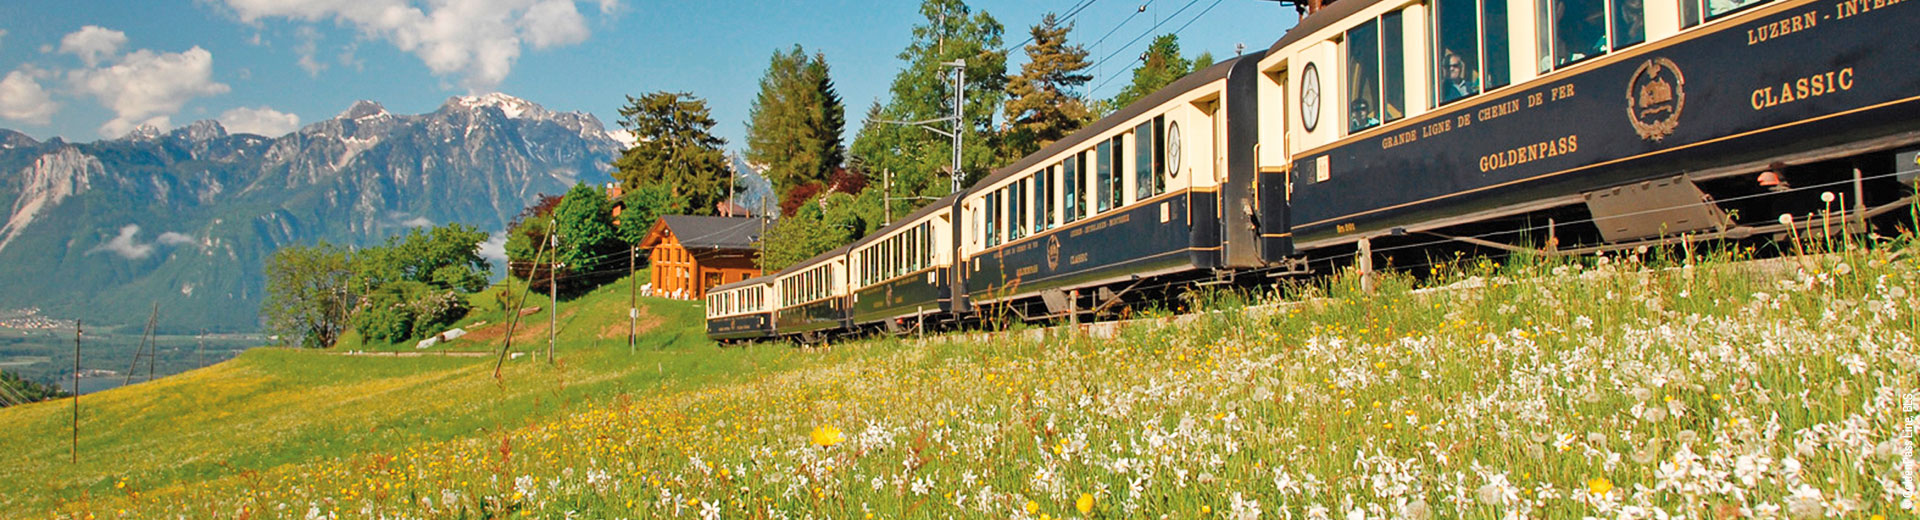 Goldenpass Line Montreux - Lucerne